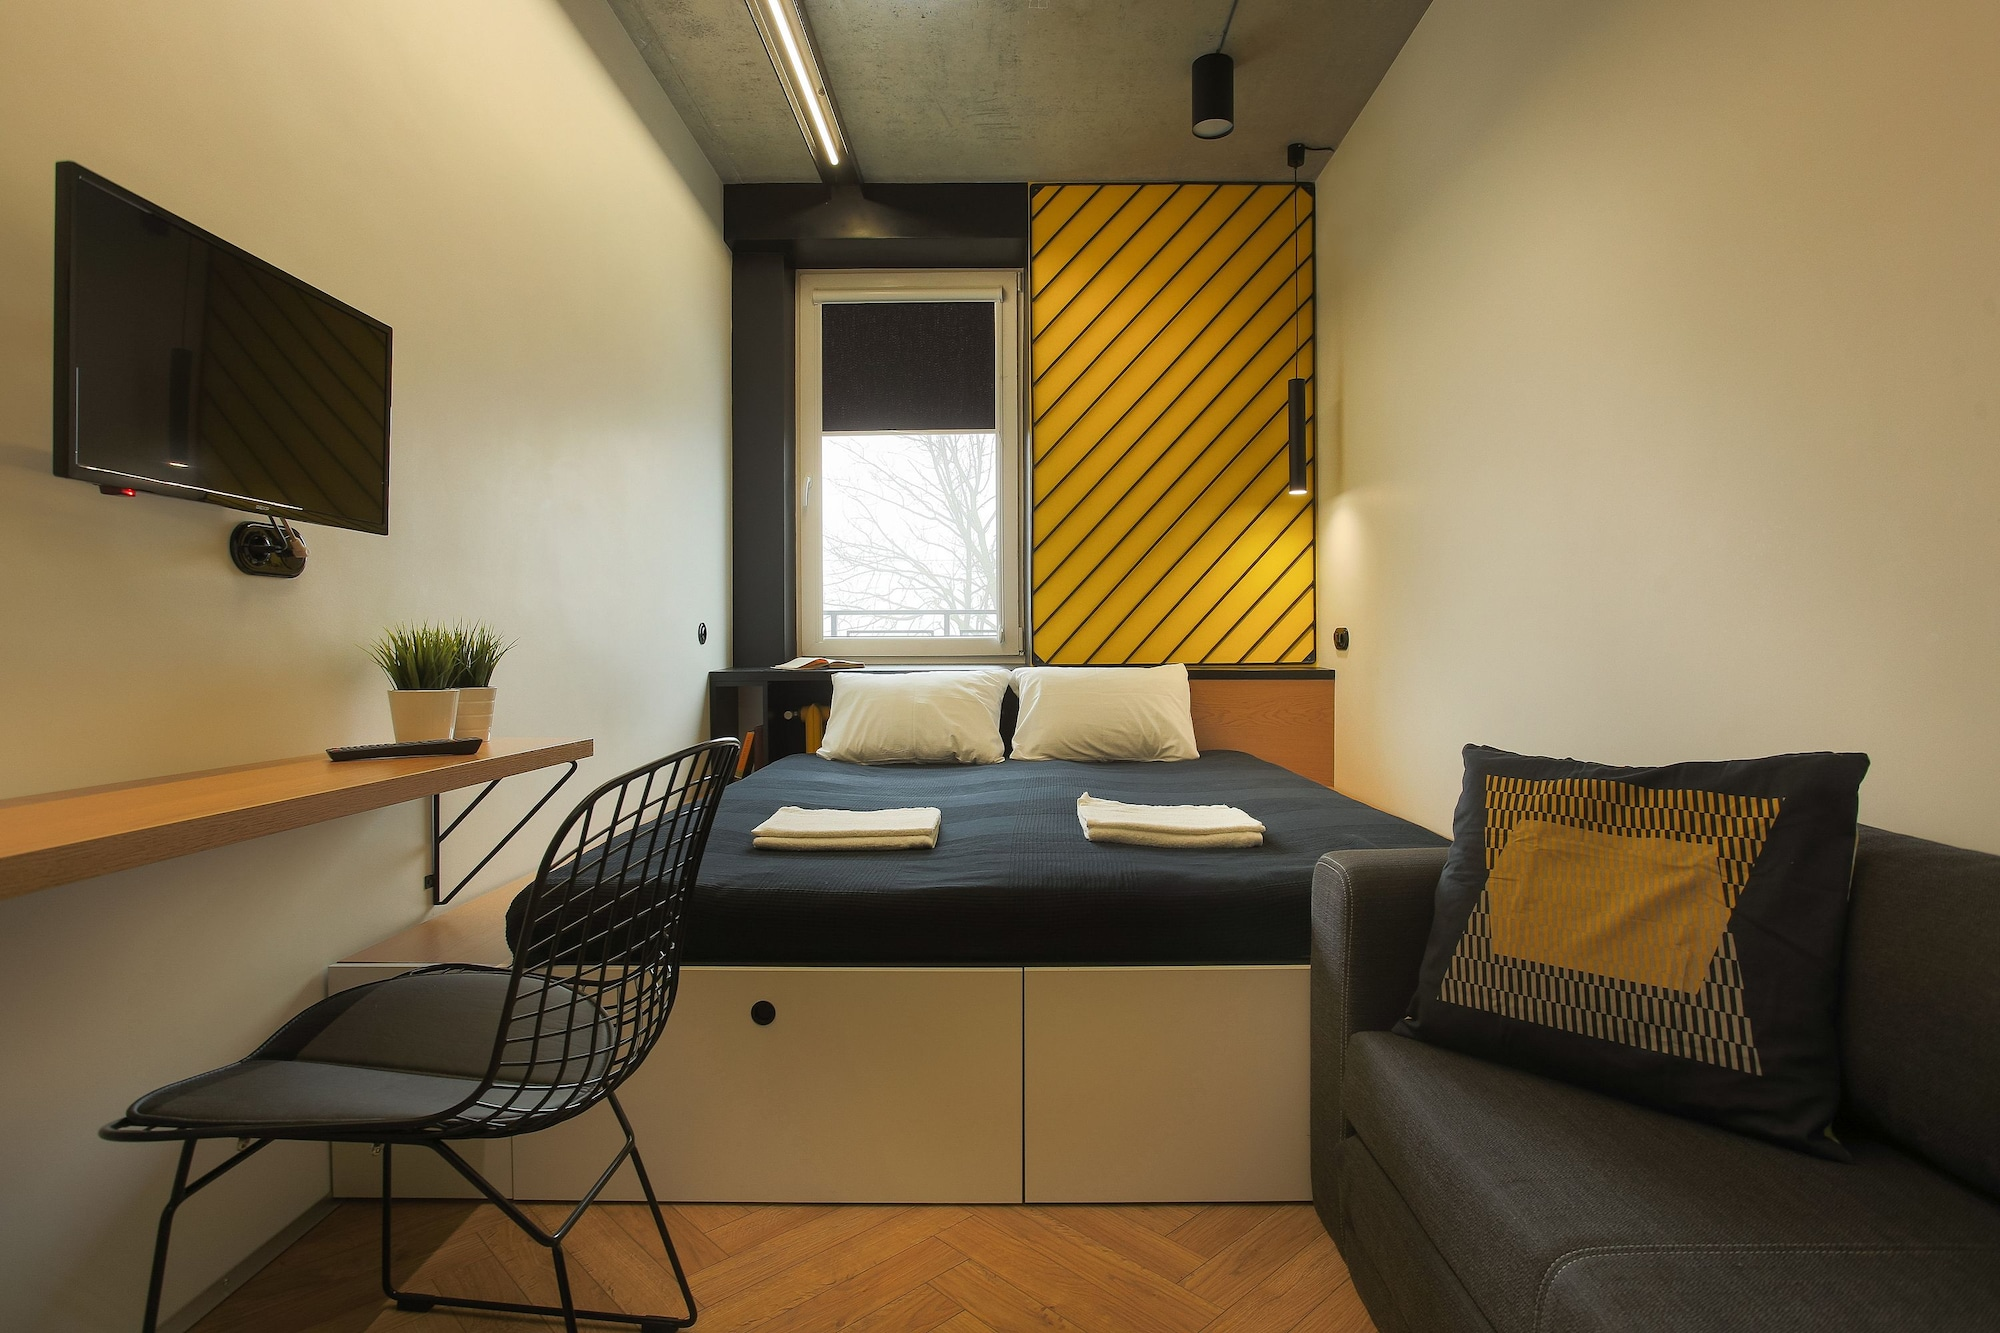 Suffix Hostel & Apartments, Gur'evskiy rayon